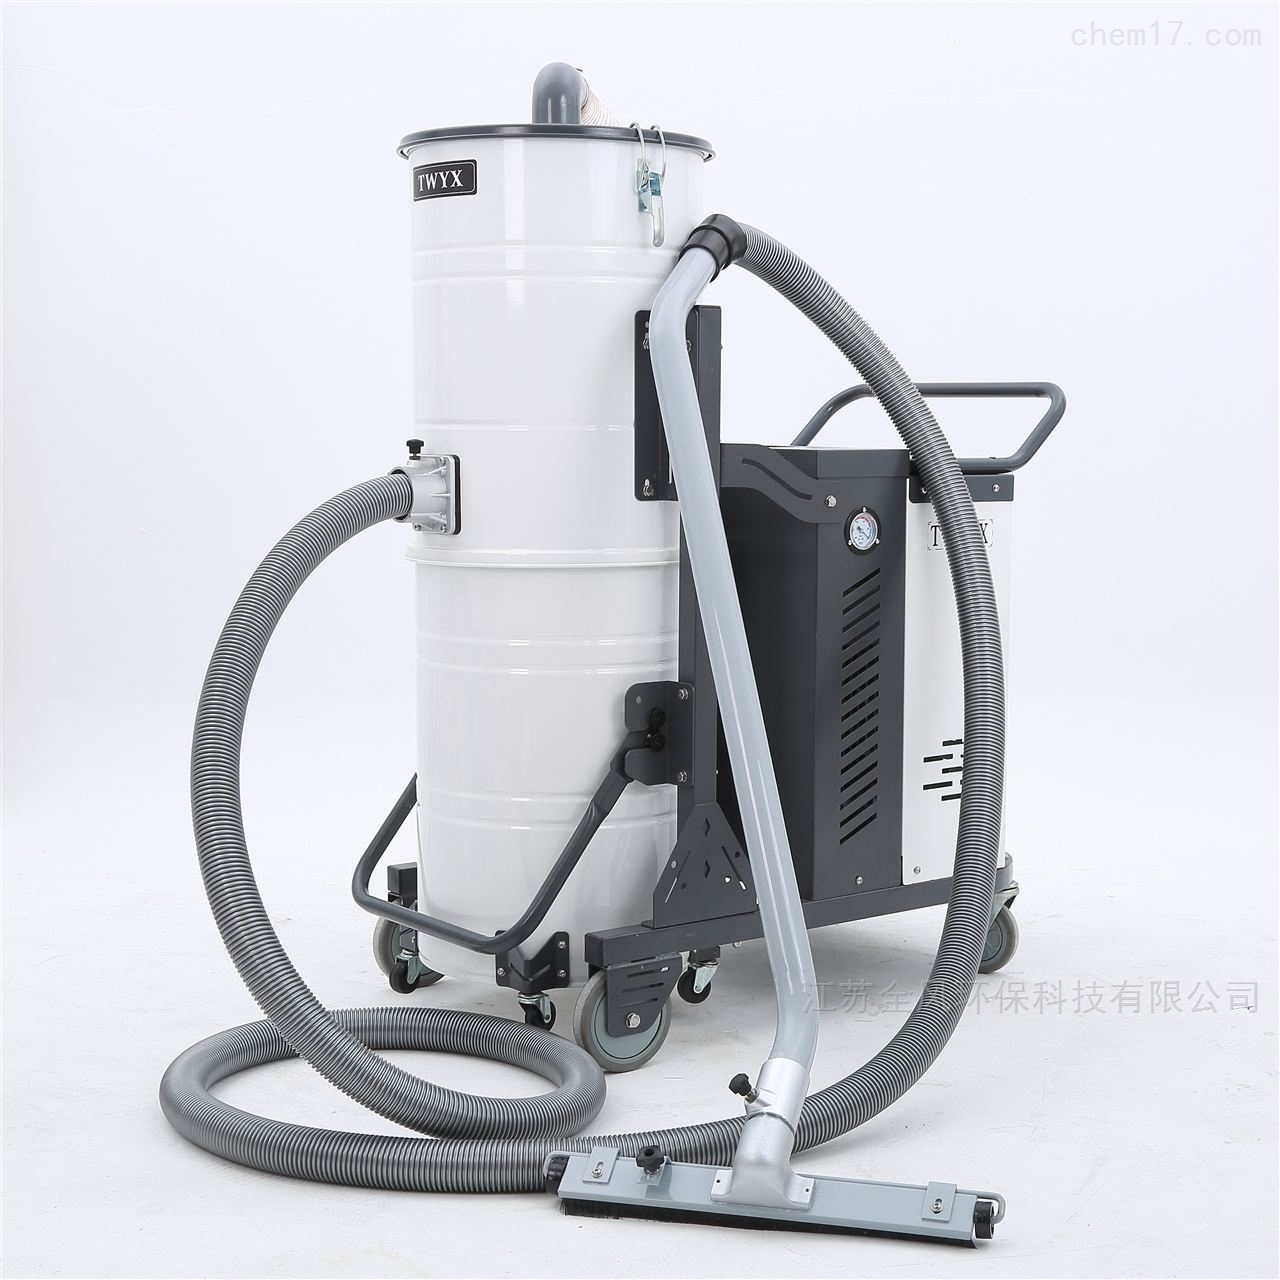 SH-40-1环保型重型工业移动吸尘器